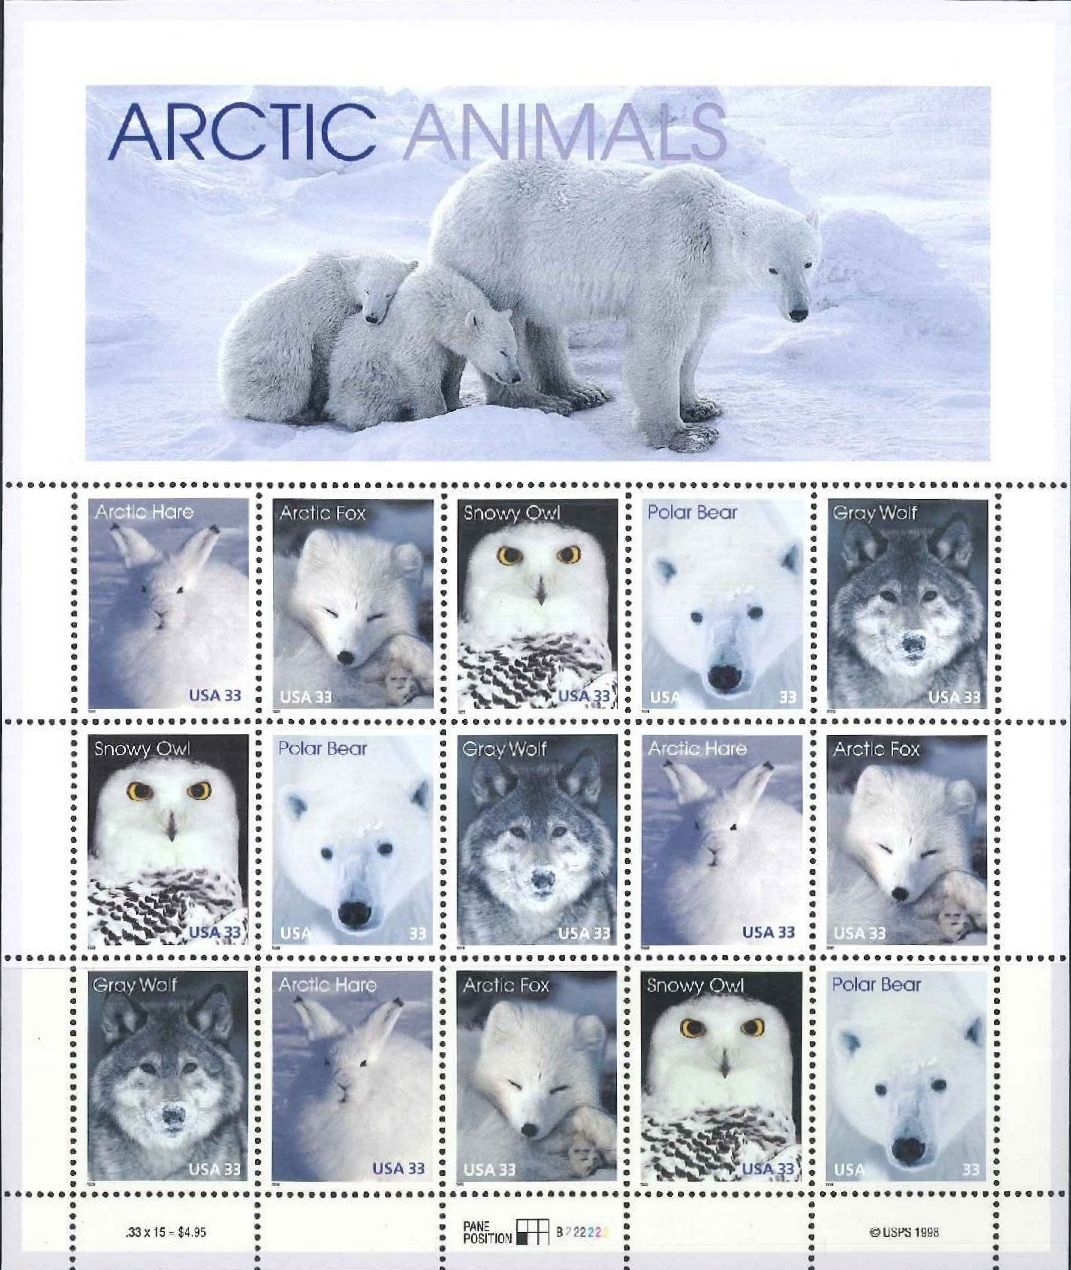 United States of America 1999 Arctic Animals Sa.jpg